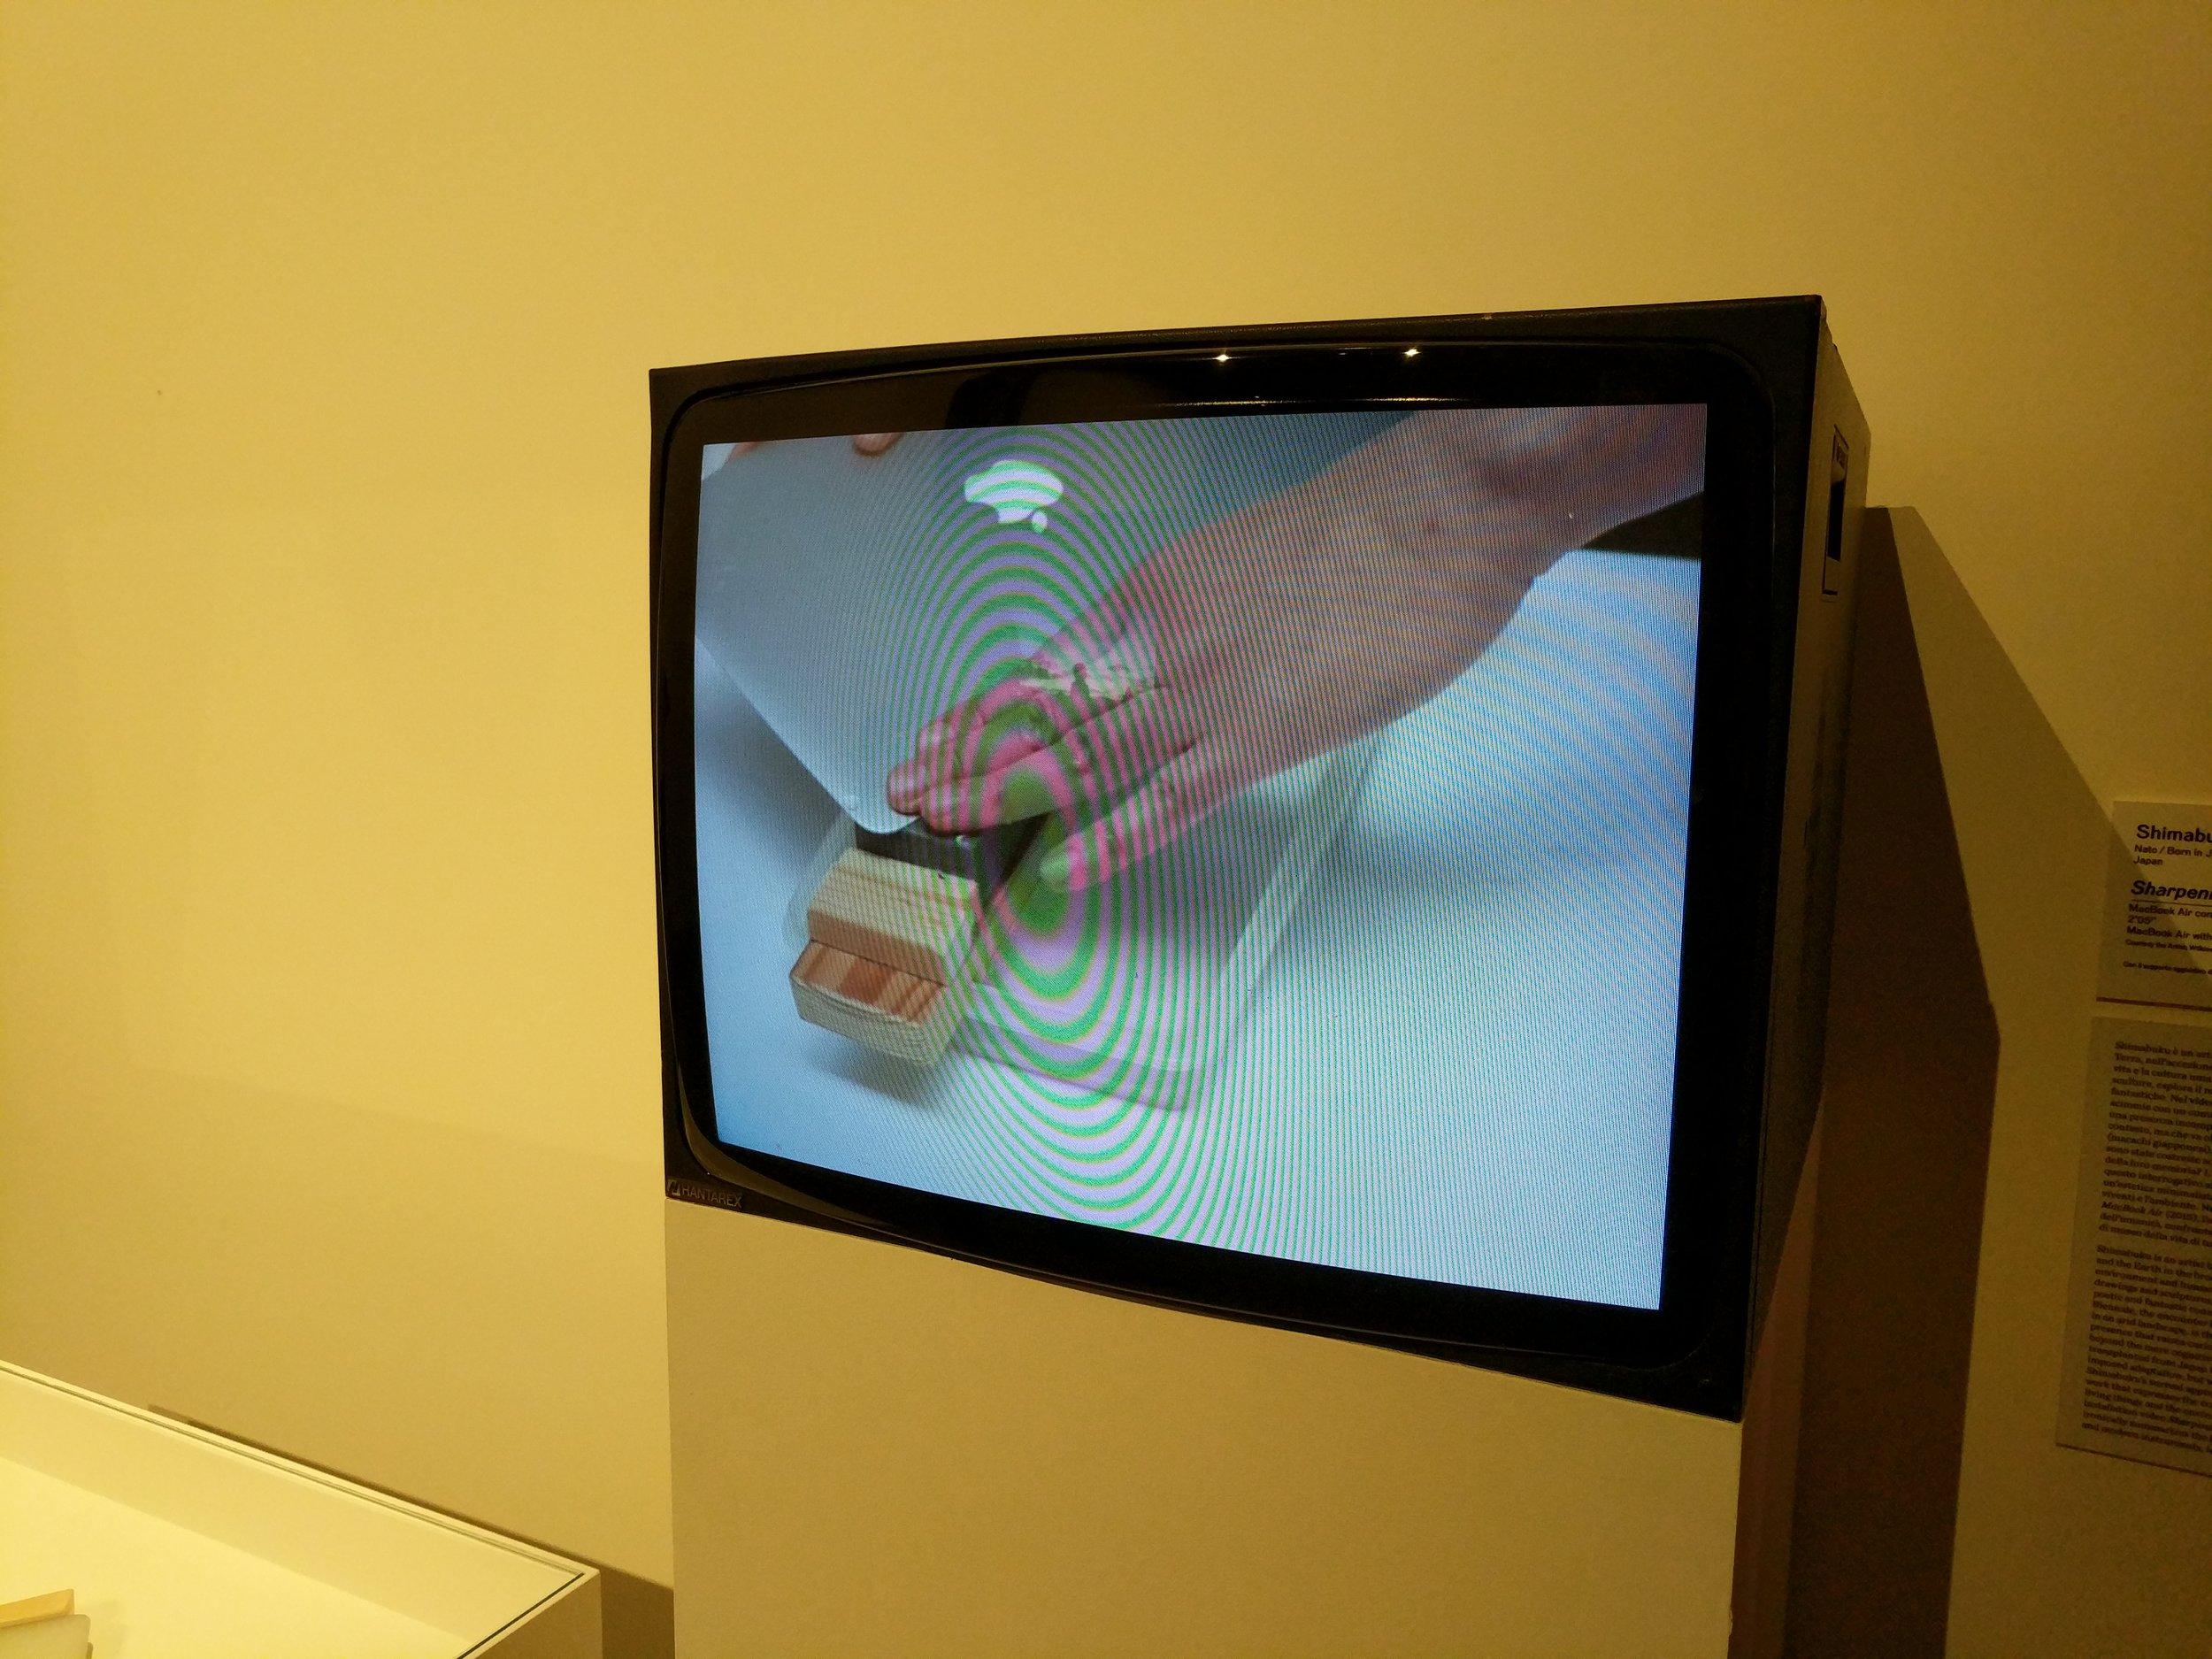 1  - Sharpening a Macbook Air by Shimabuku, 2015.jpg